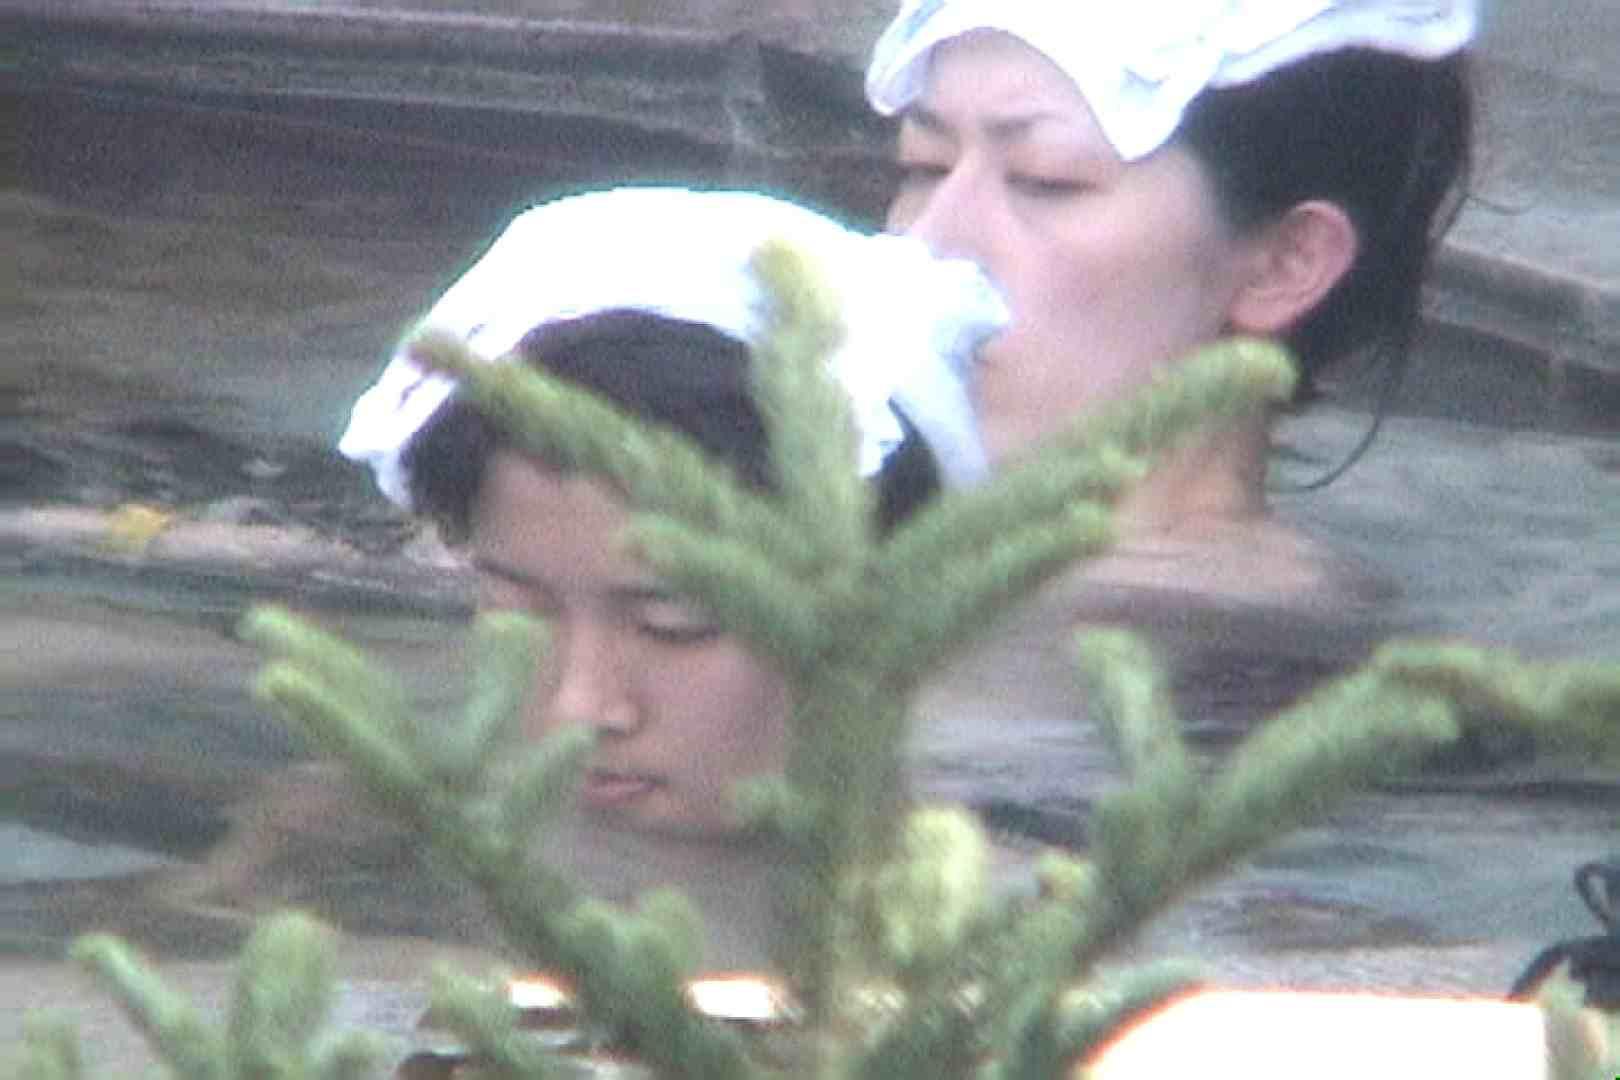 Aquaな露天風呂Vol.80【VIP限定】 露天風呂編   盗撮シリーズ  76PIX 31